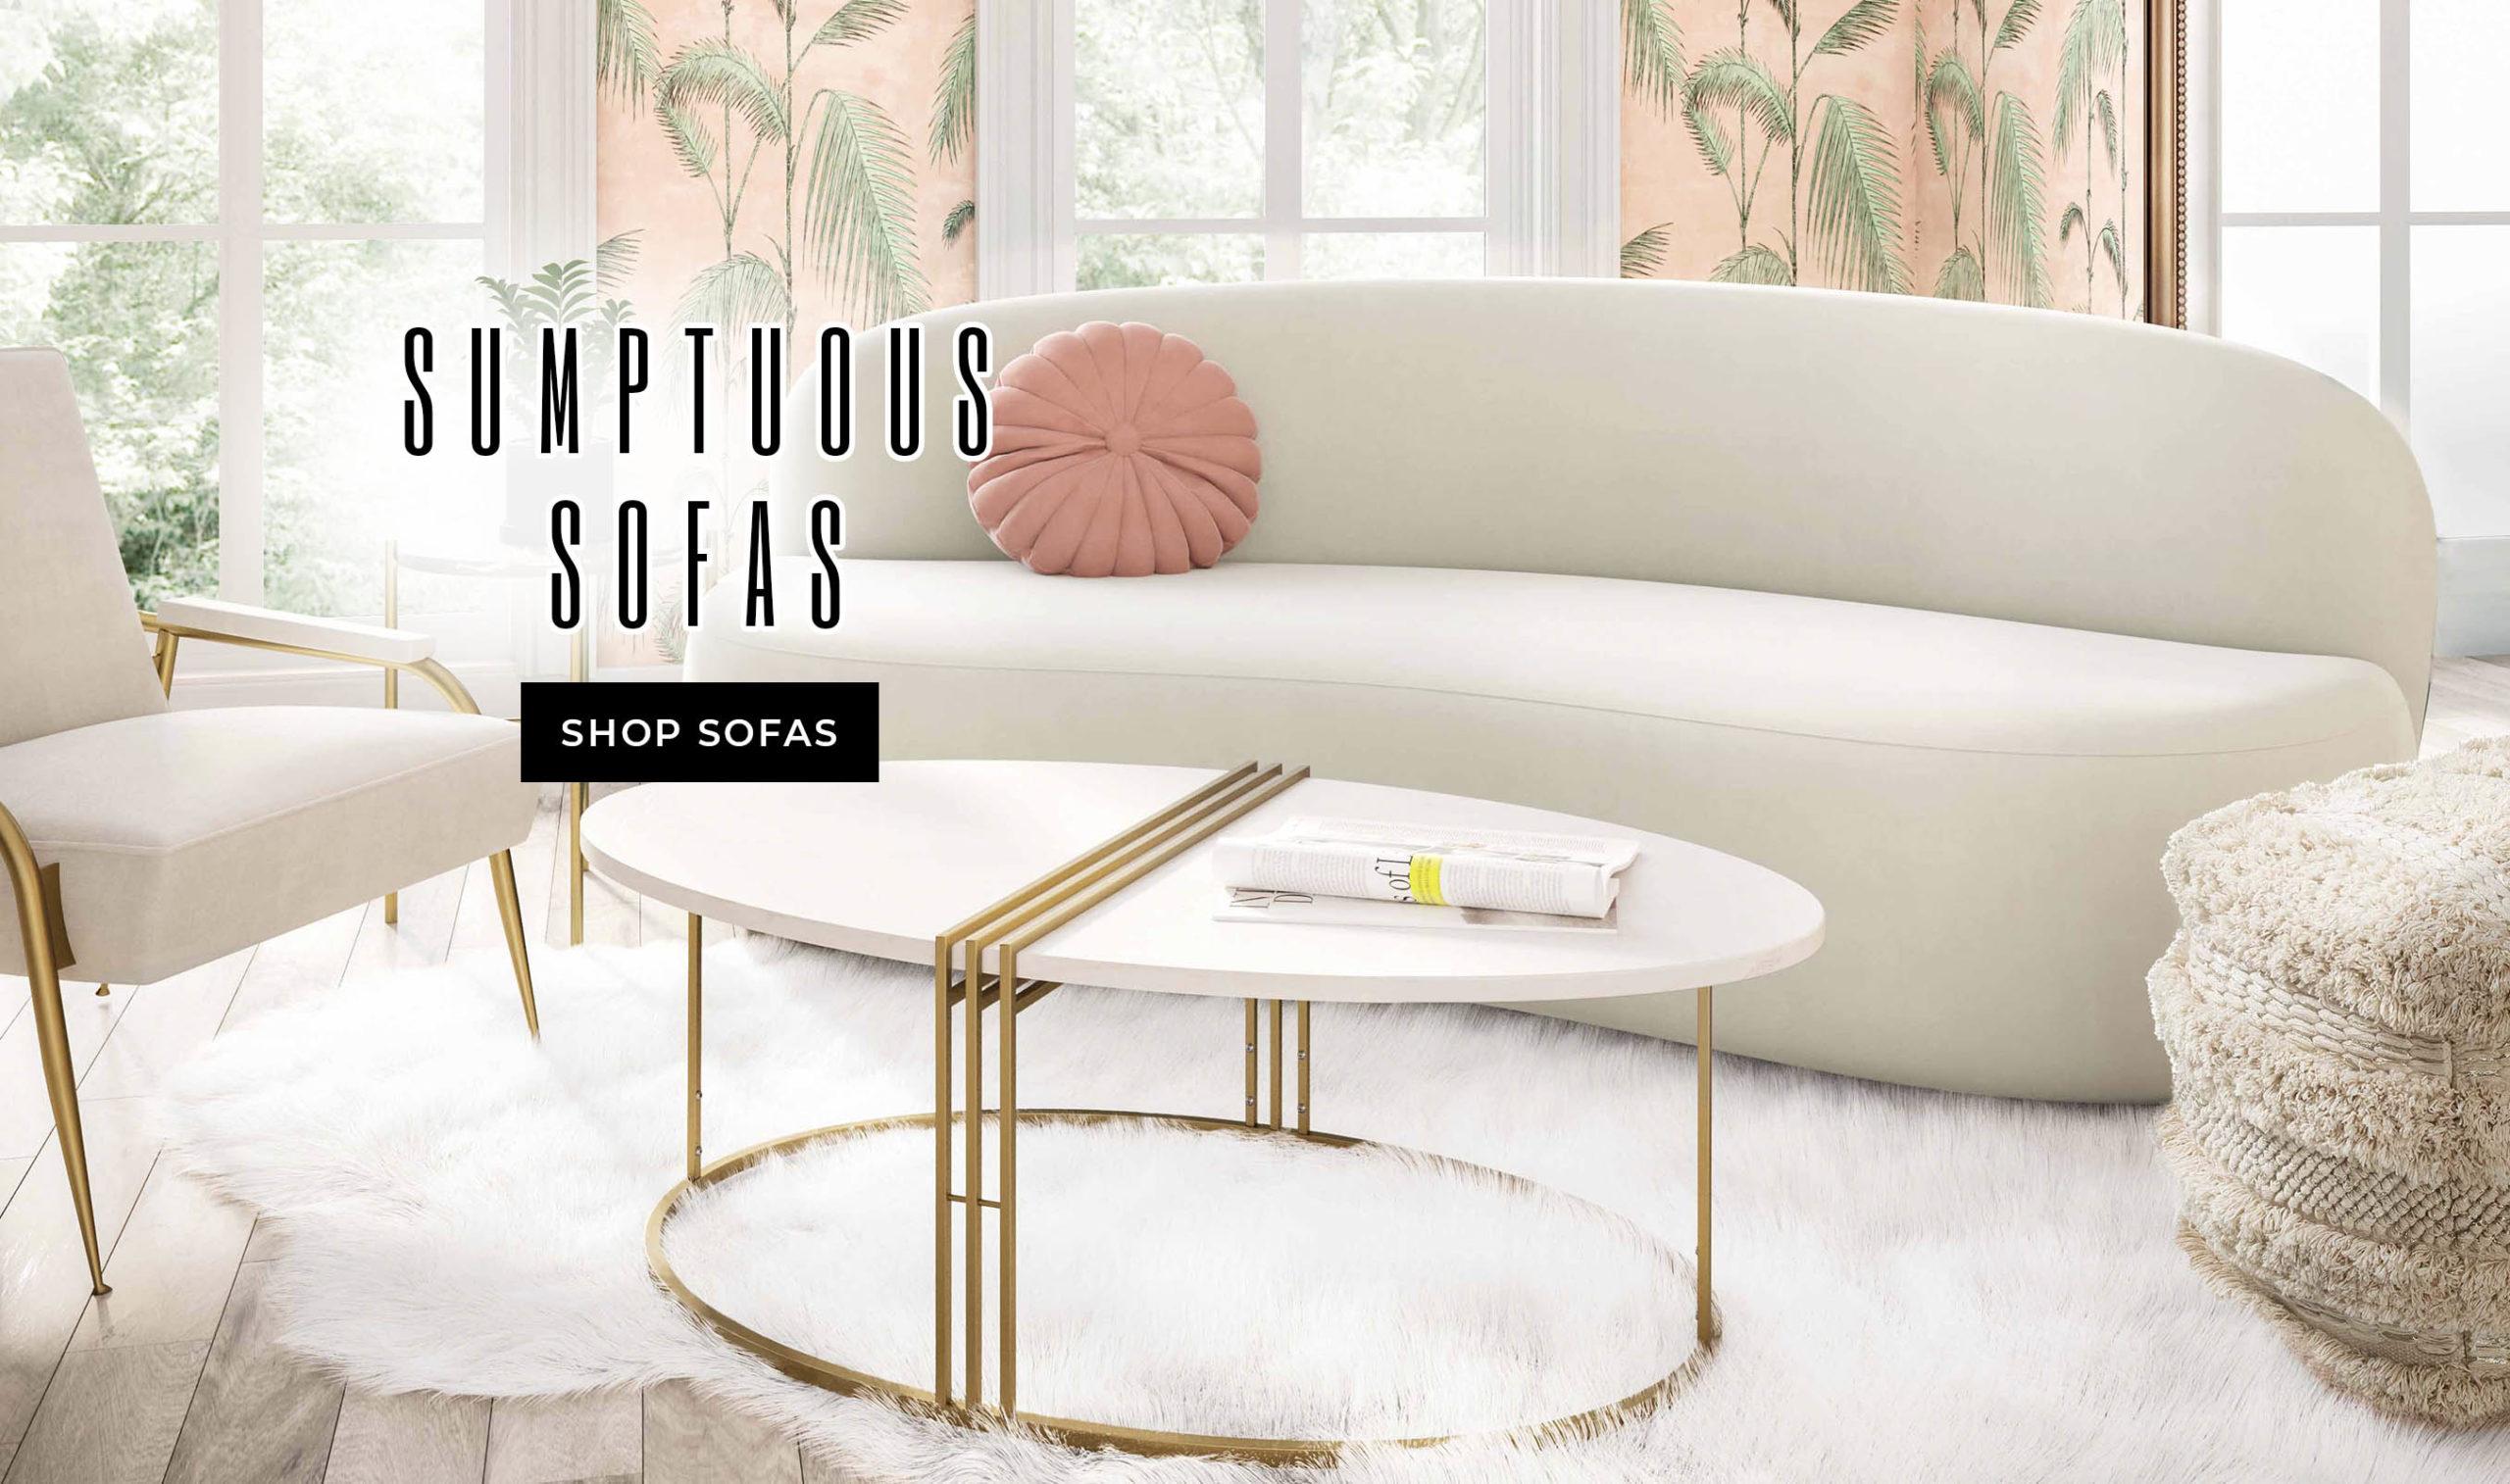 Desktop Sofas scaled